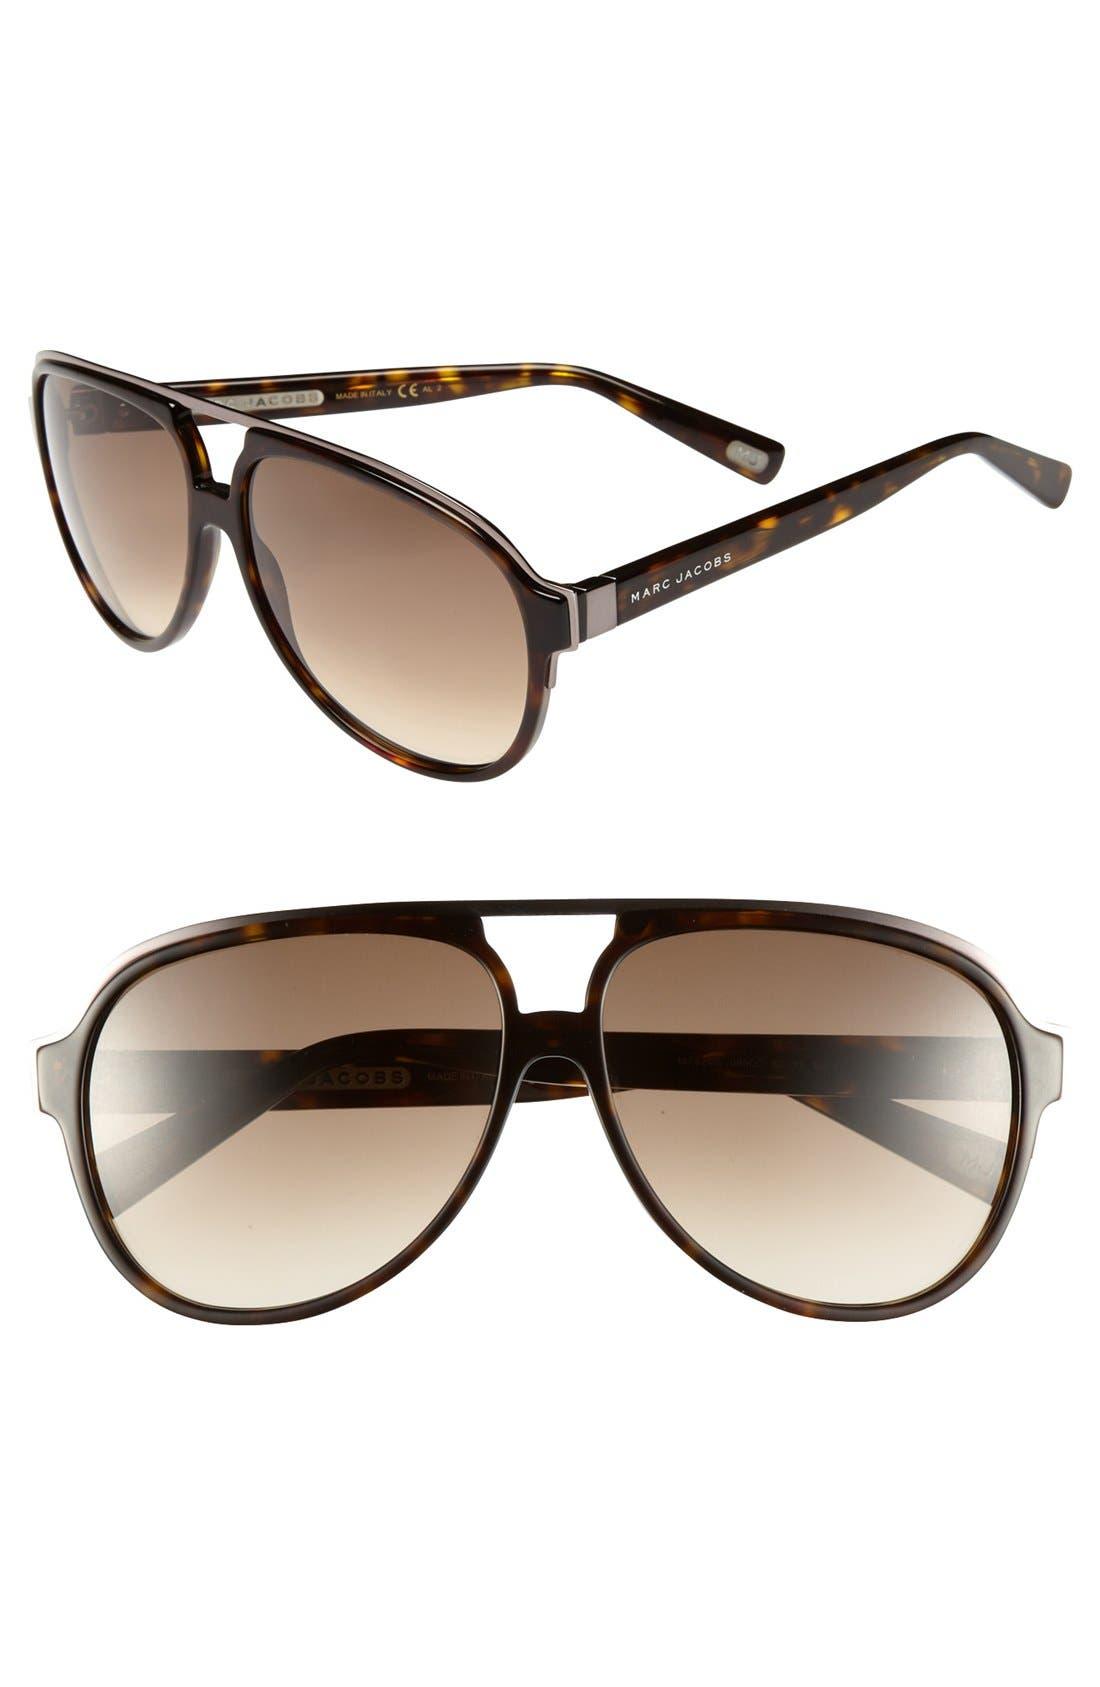 Main Image - MARC JACOBS 60mm Sunglasses